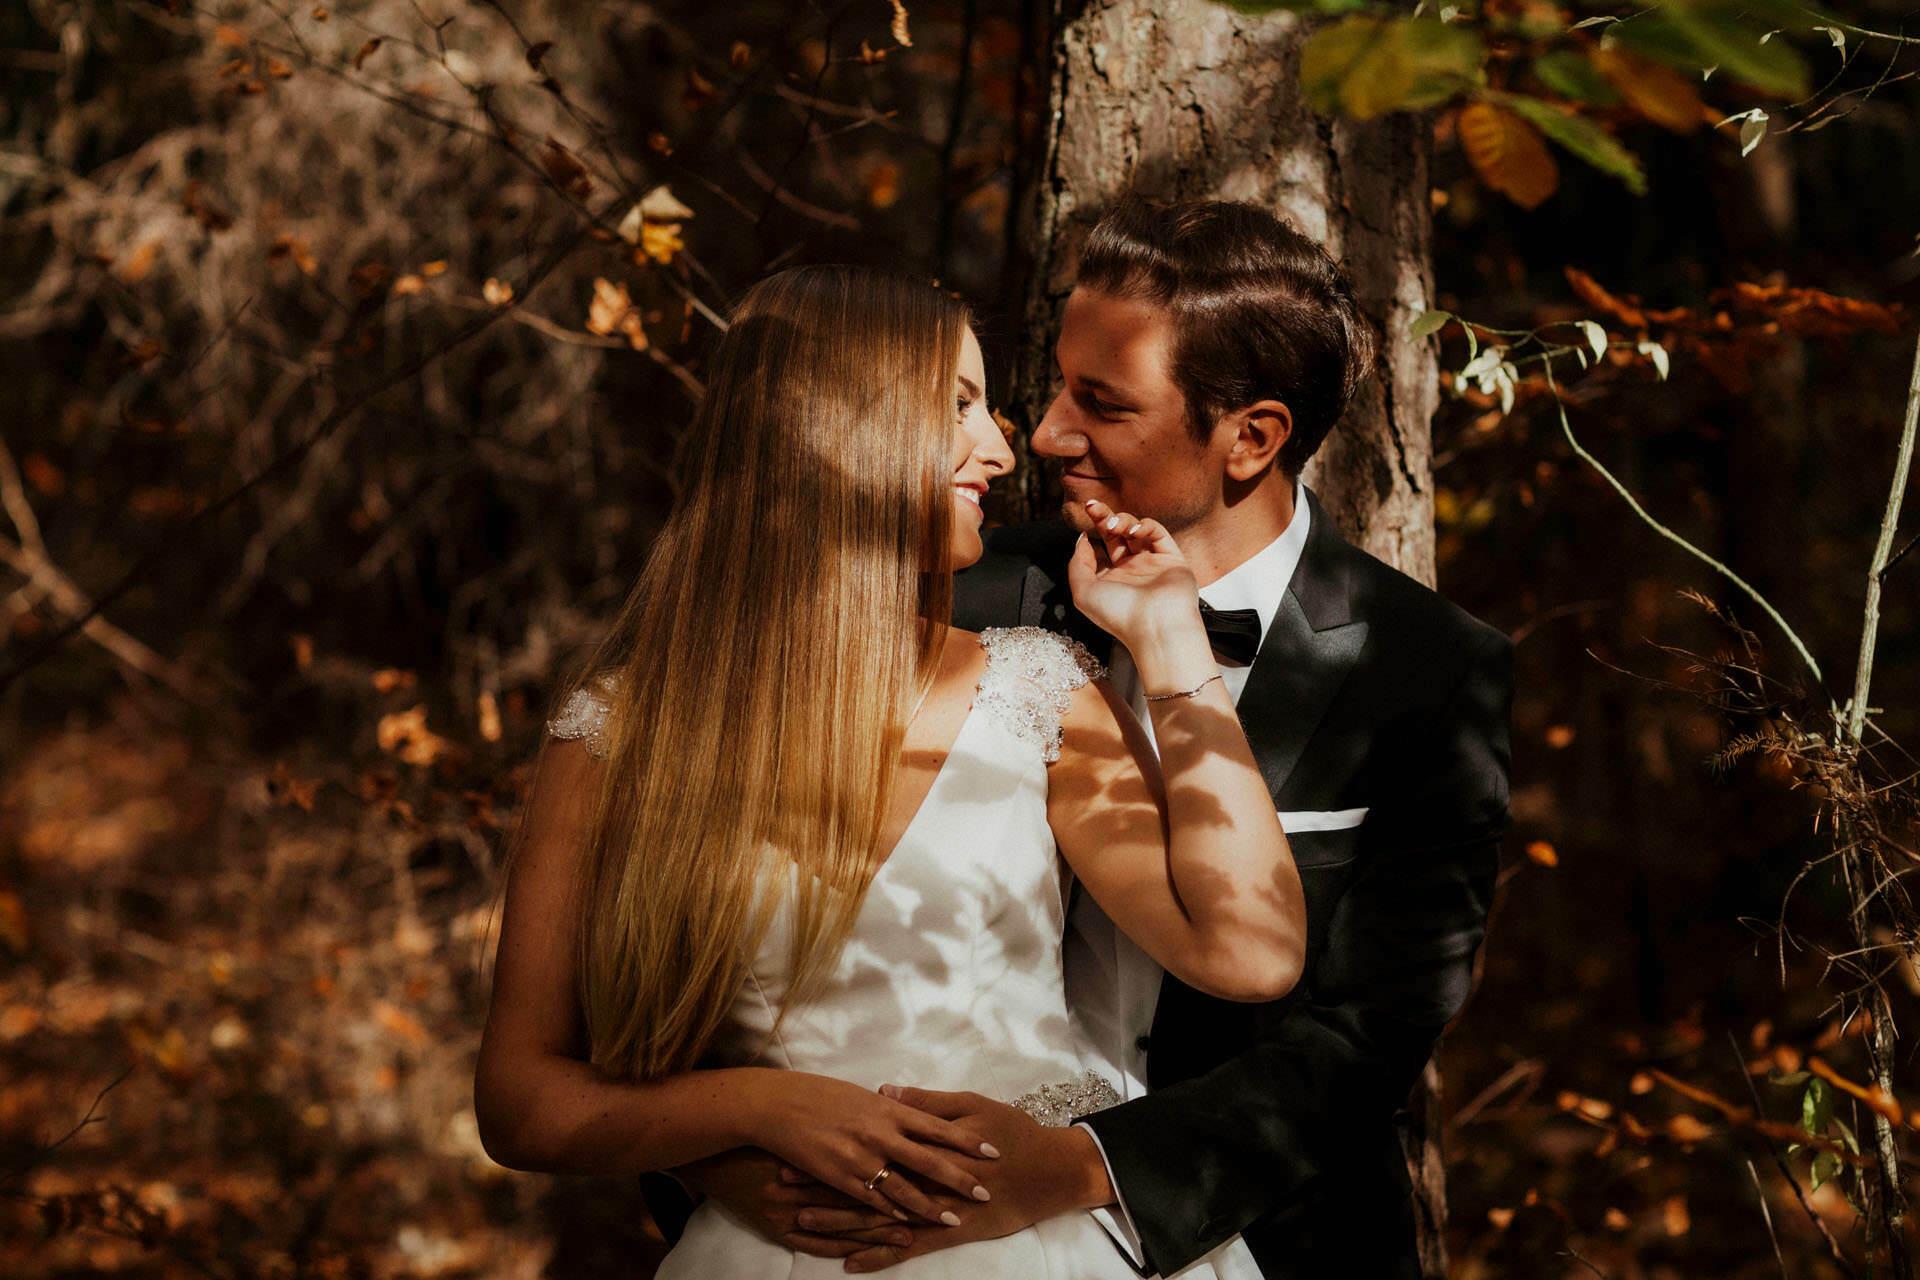 Patrycja i Patryk wesele stara zajezdnia 0049